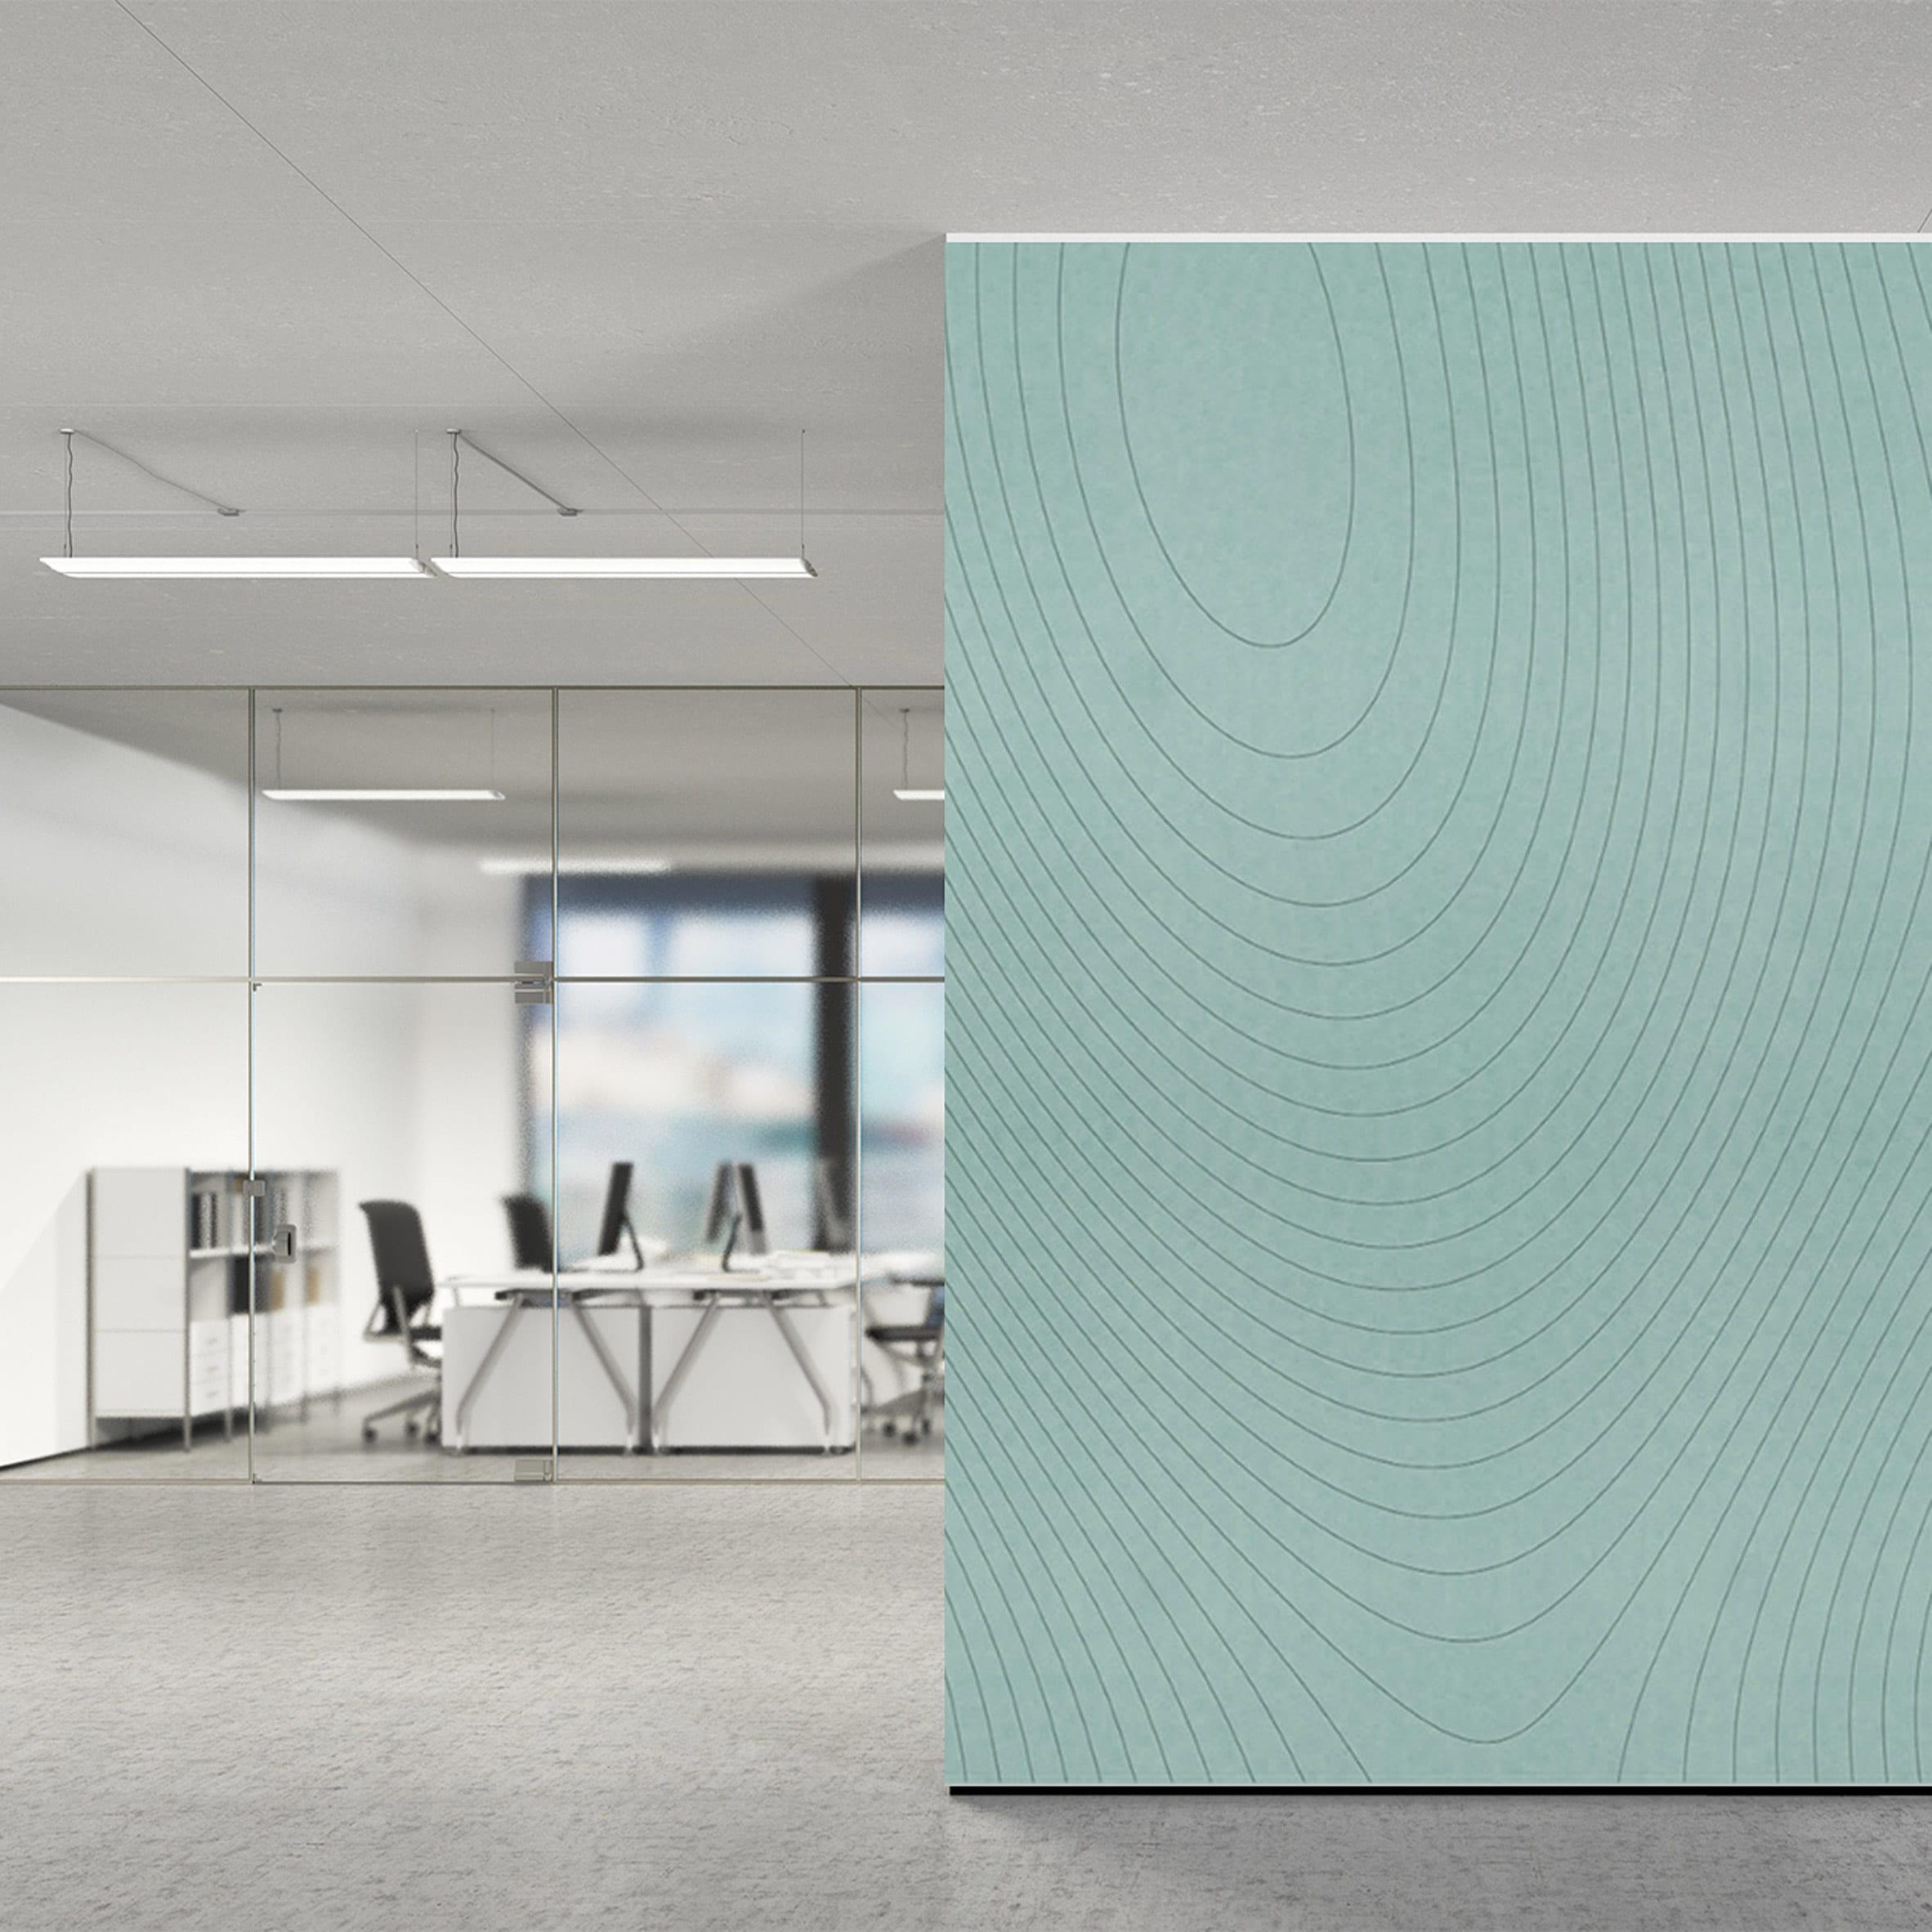 Contour acoustic panel by Jeffrey Ibanez for Impact Acoustic